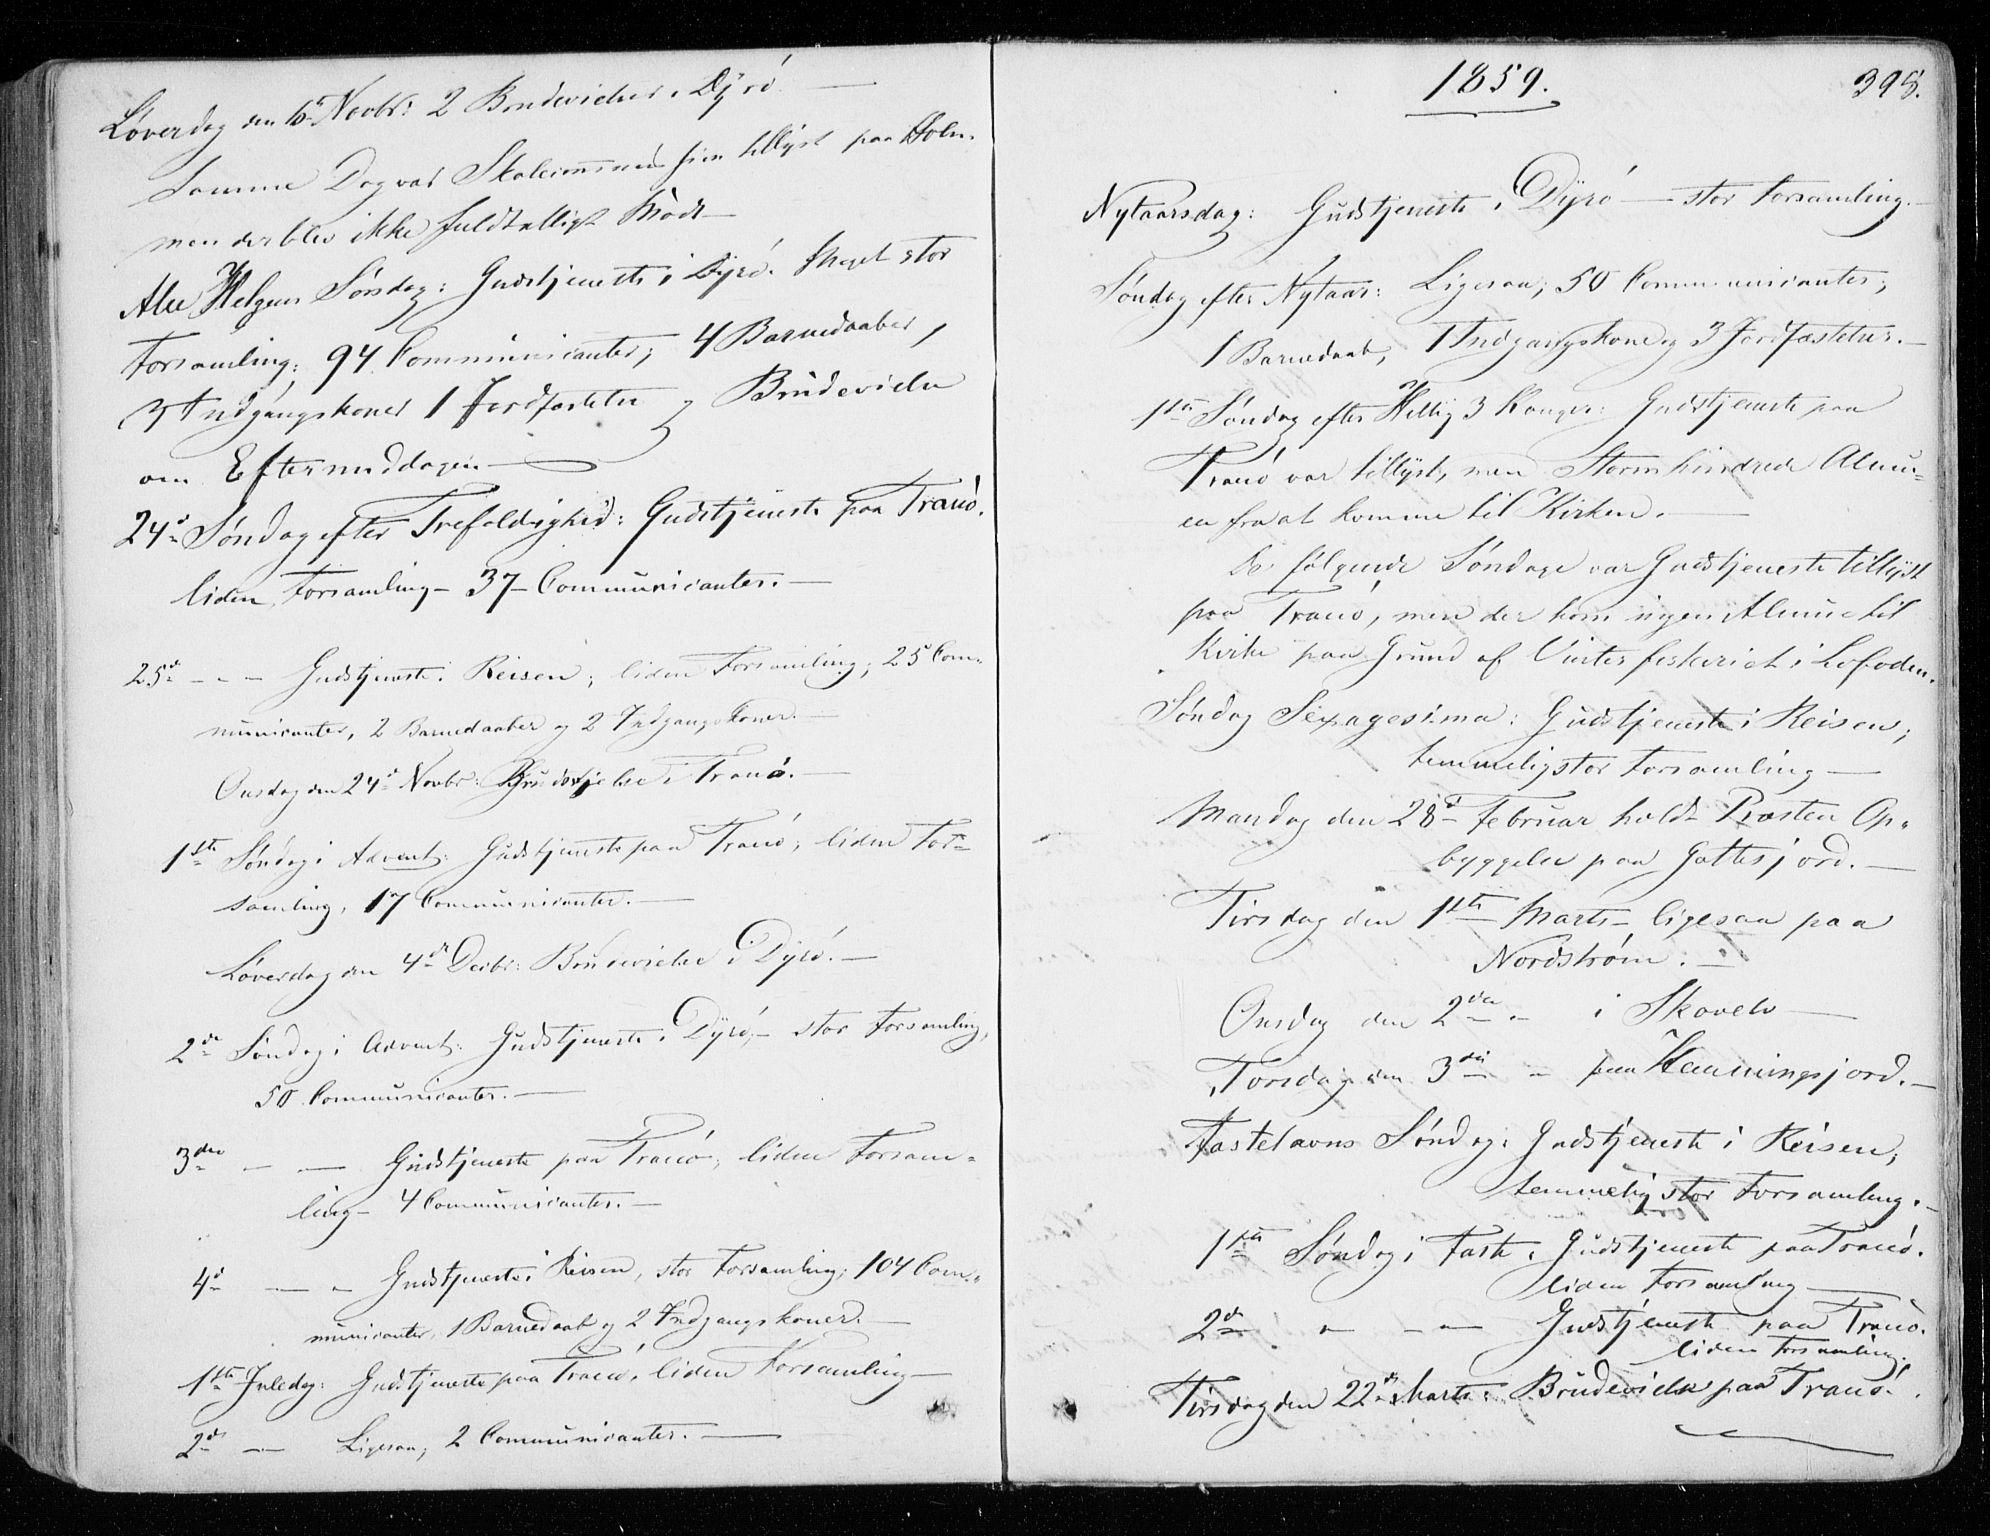 SATØ, Tranøy sokneprestkontor, I/Ia/Iaa/L0007kirke: Ministerialbok nr. 7, 1856-1866, s. 398